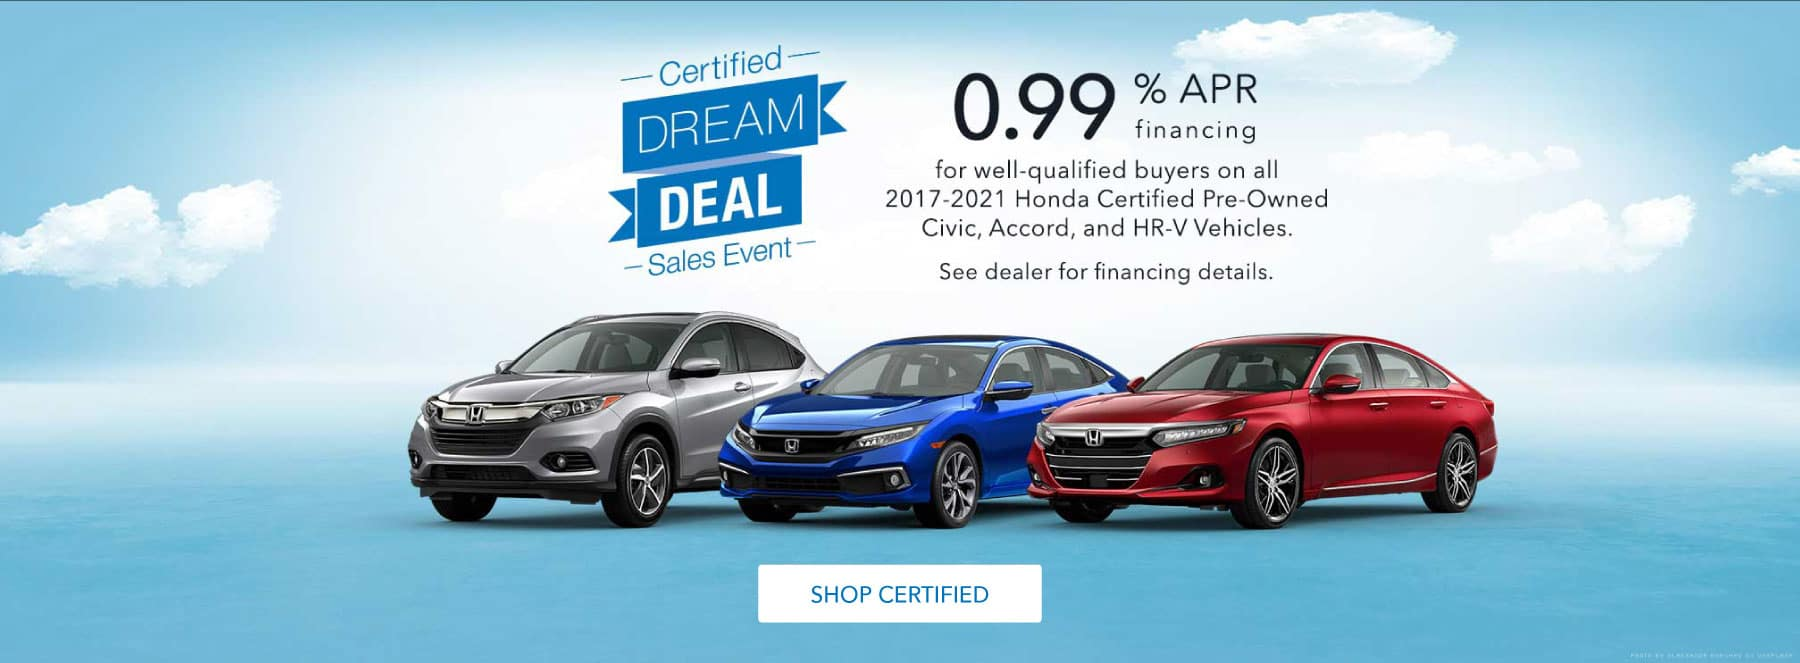 Honda_Certified_Dream_Deal-July-2021